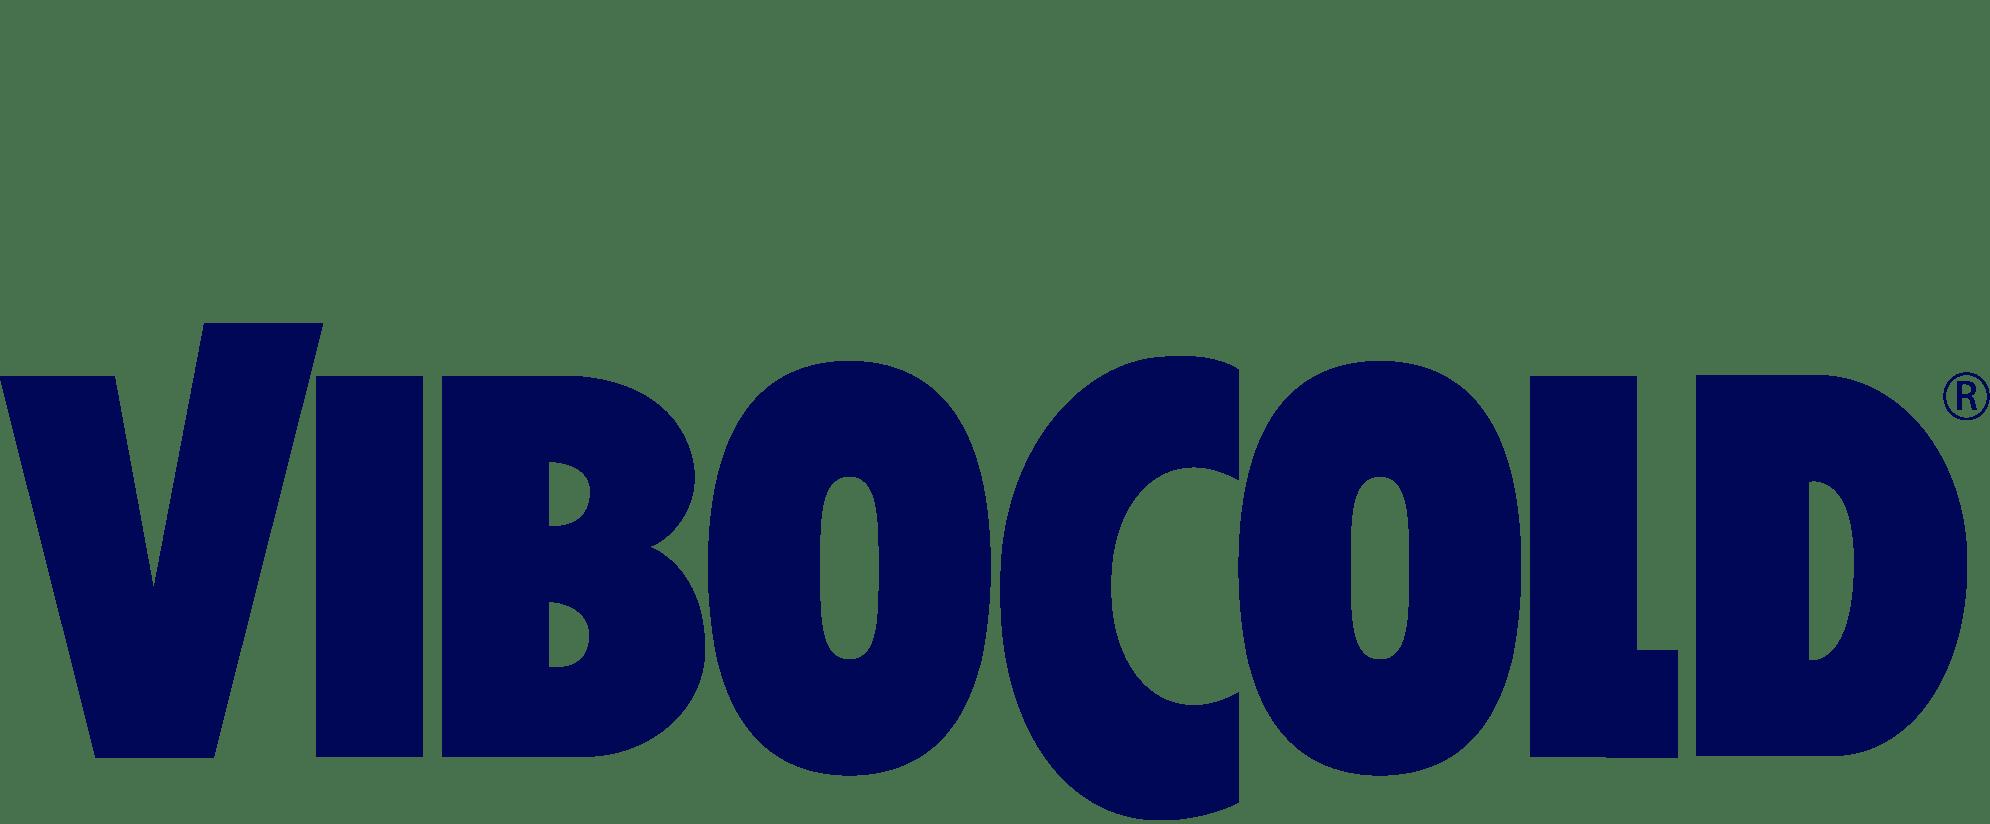 FREOR-PARTNERS-Vibocold-Denmark-logo